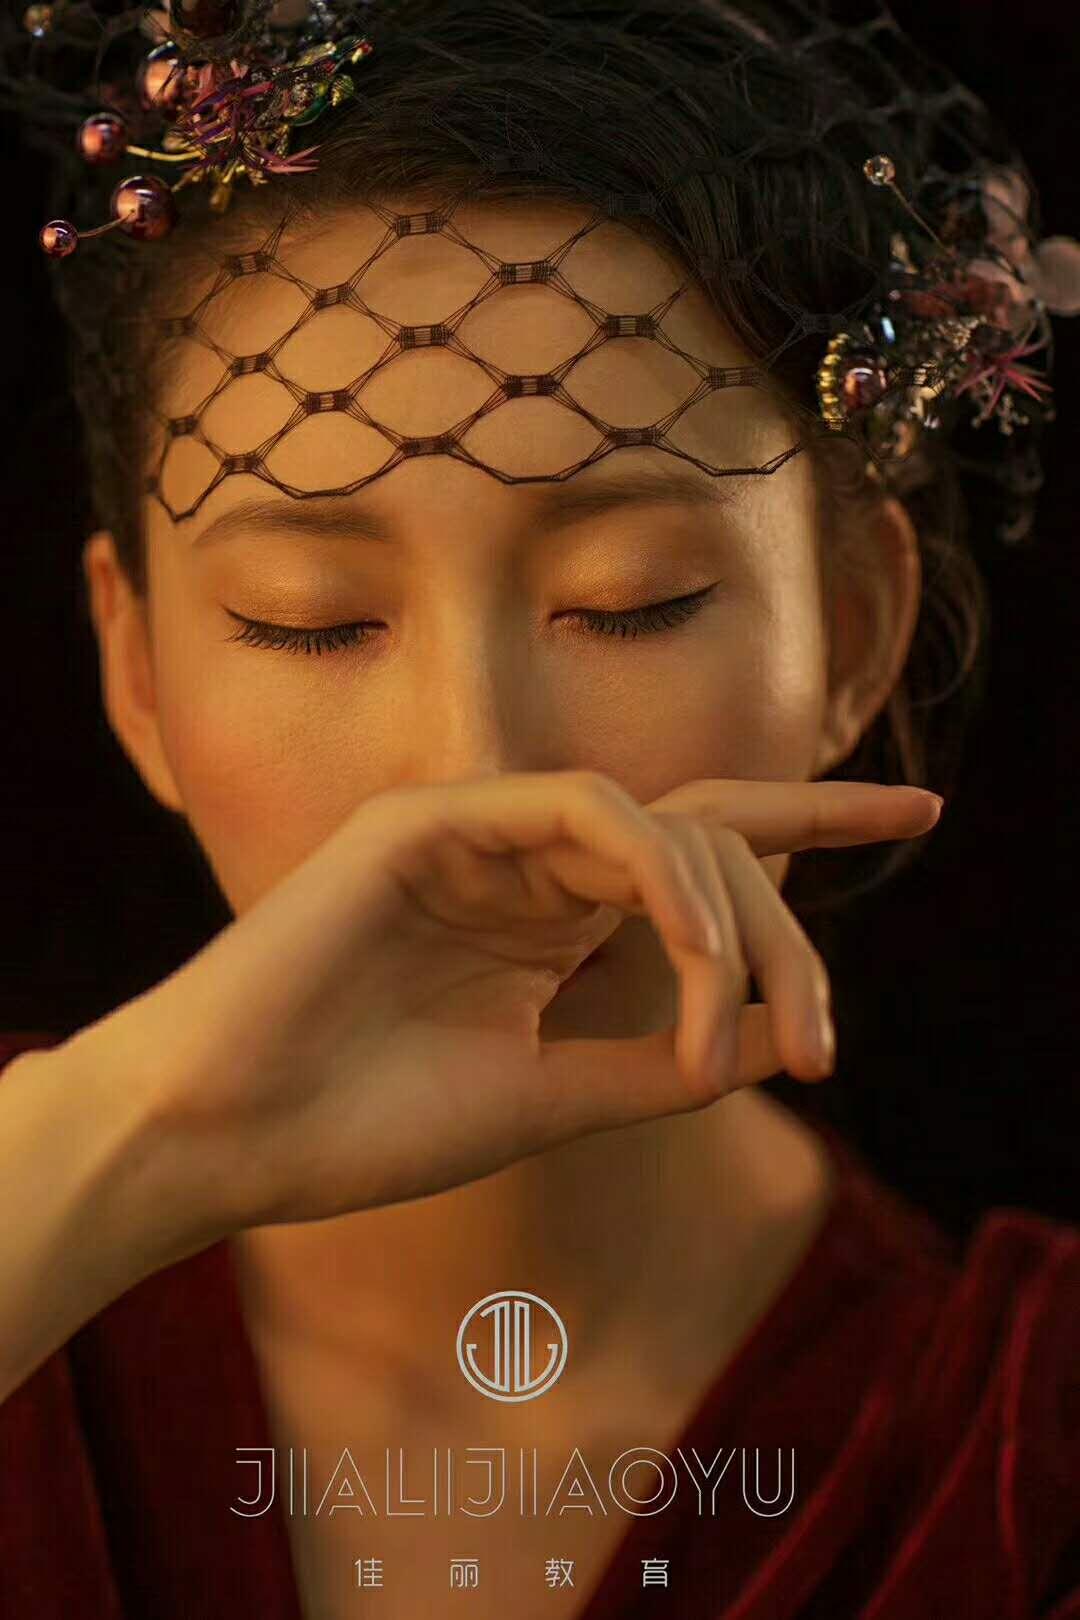 【JIALI佳丽】| 学化妆一定要避免隐形消费